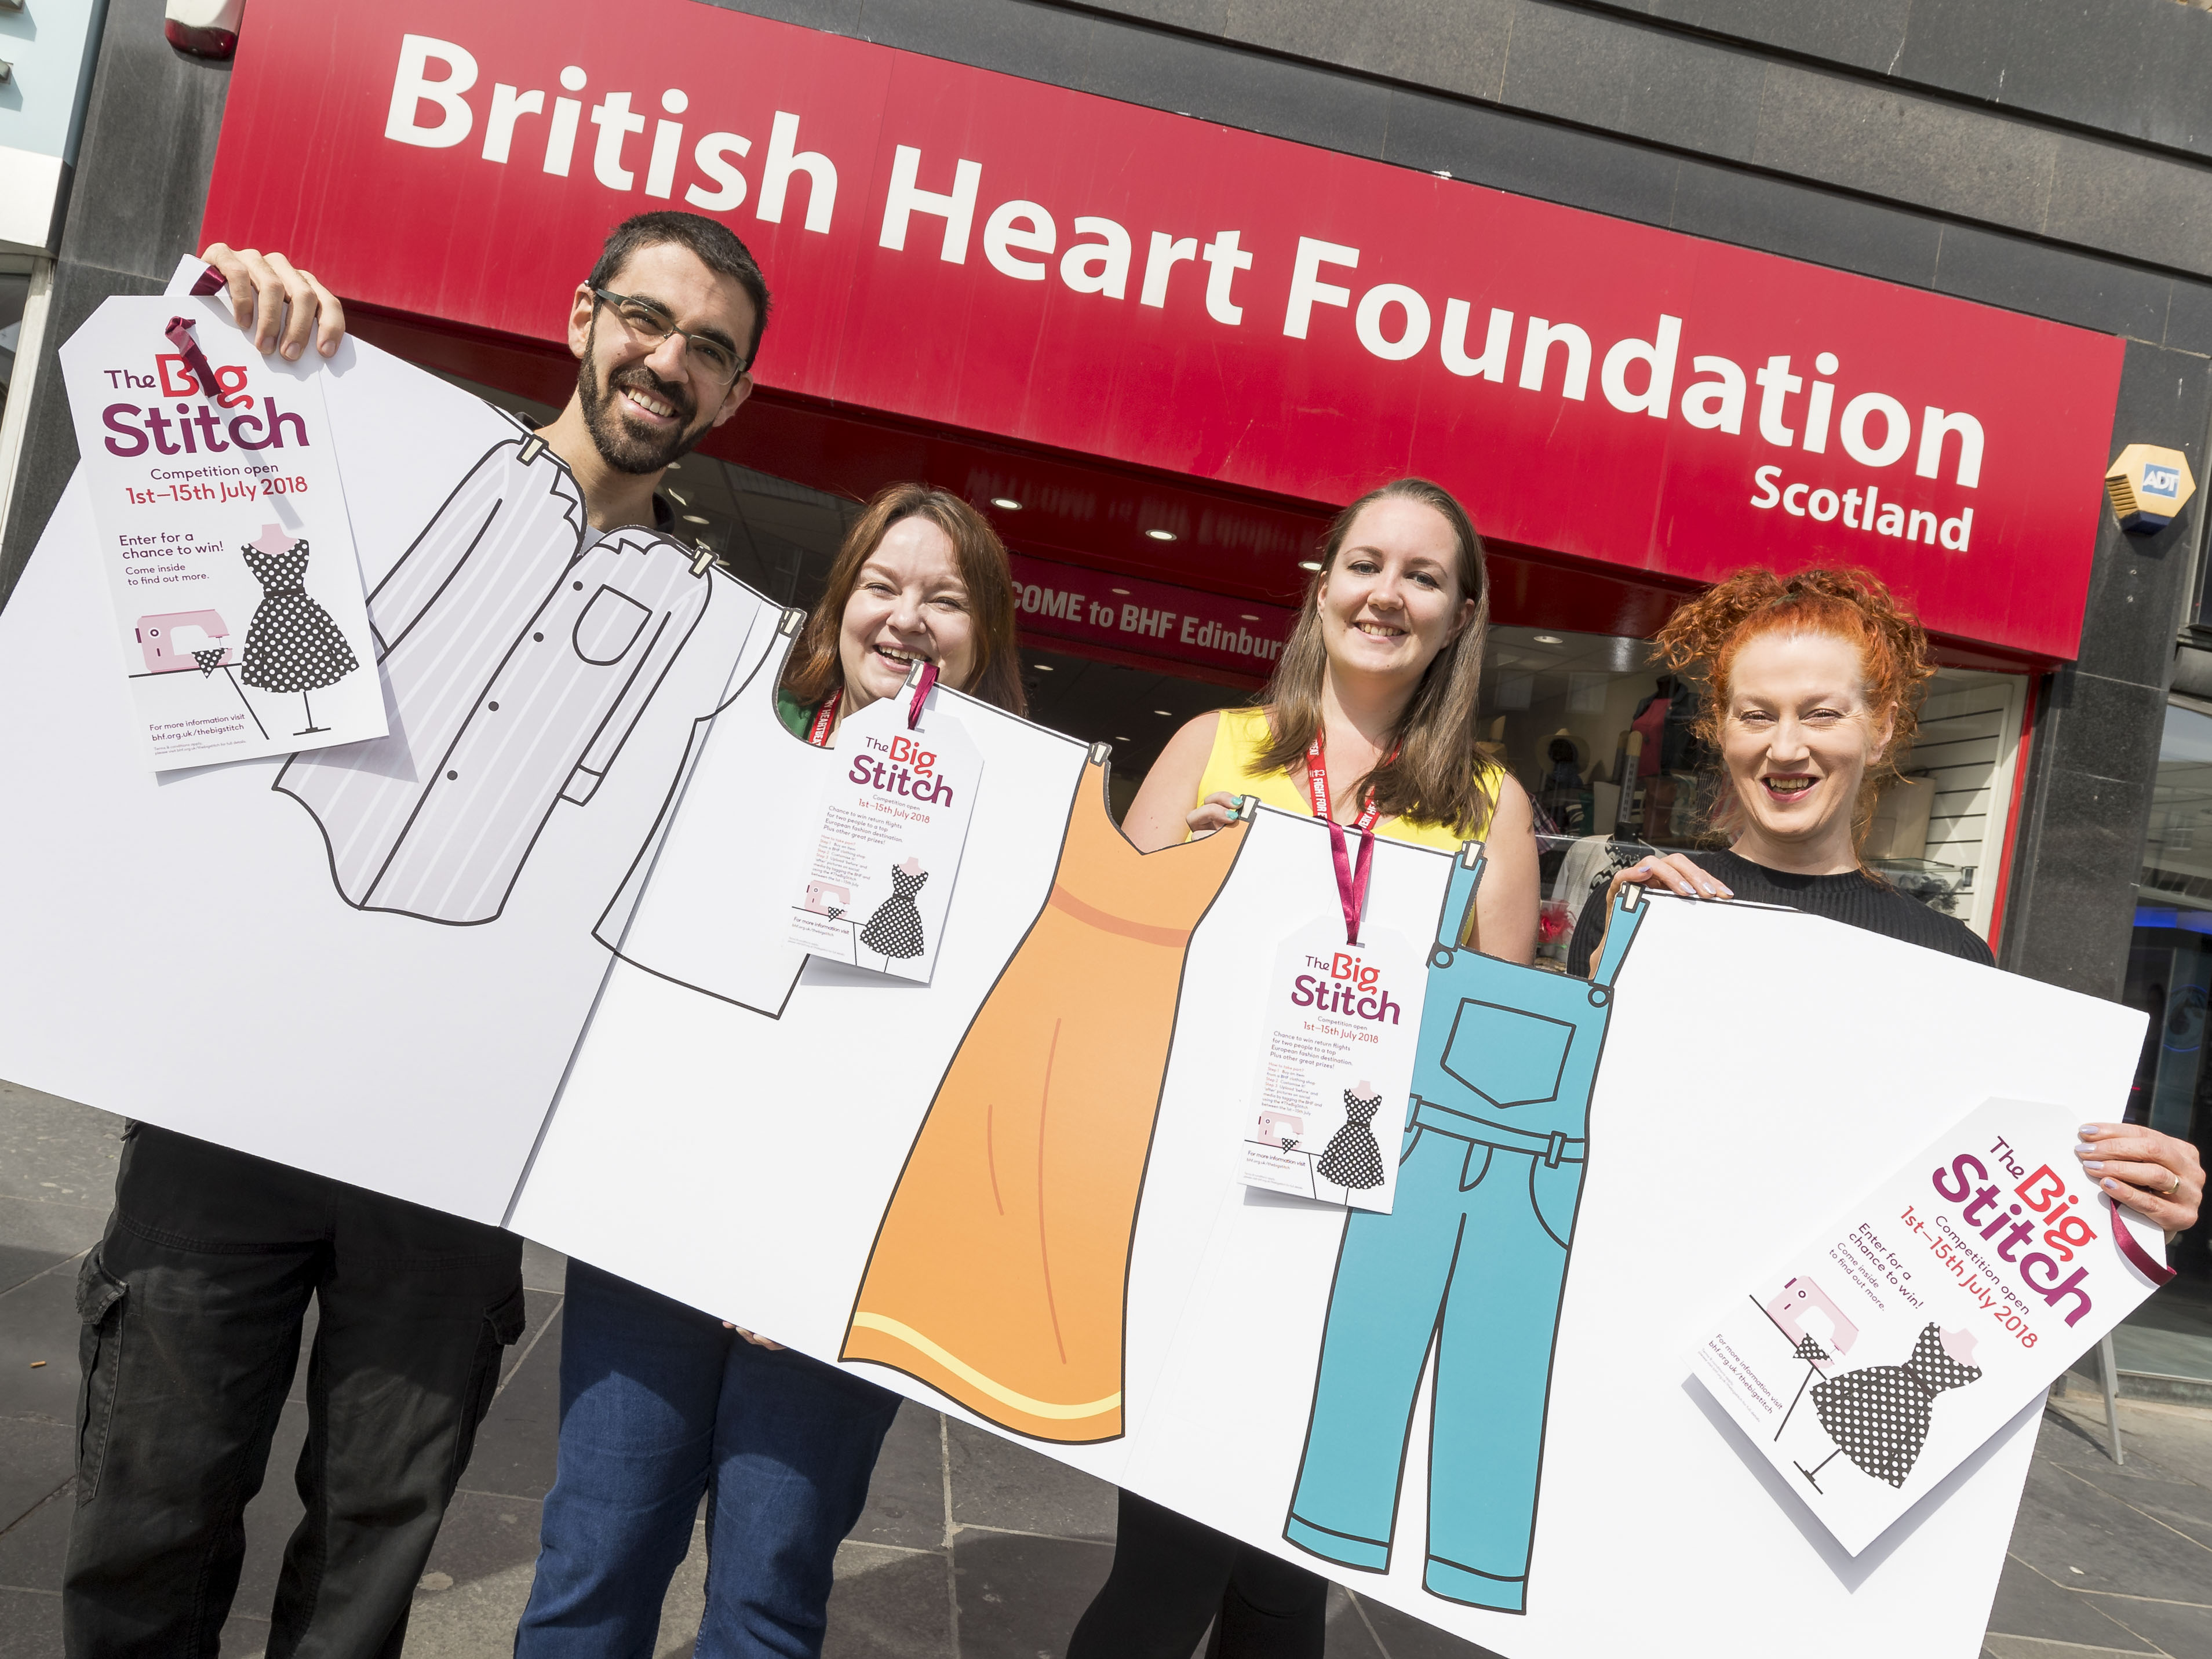 1. British Heart Foundation